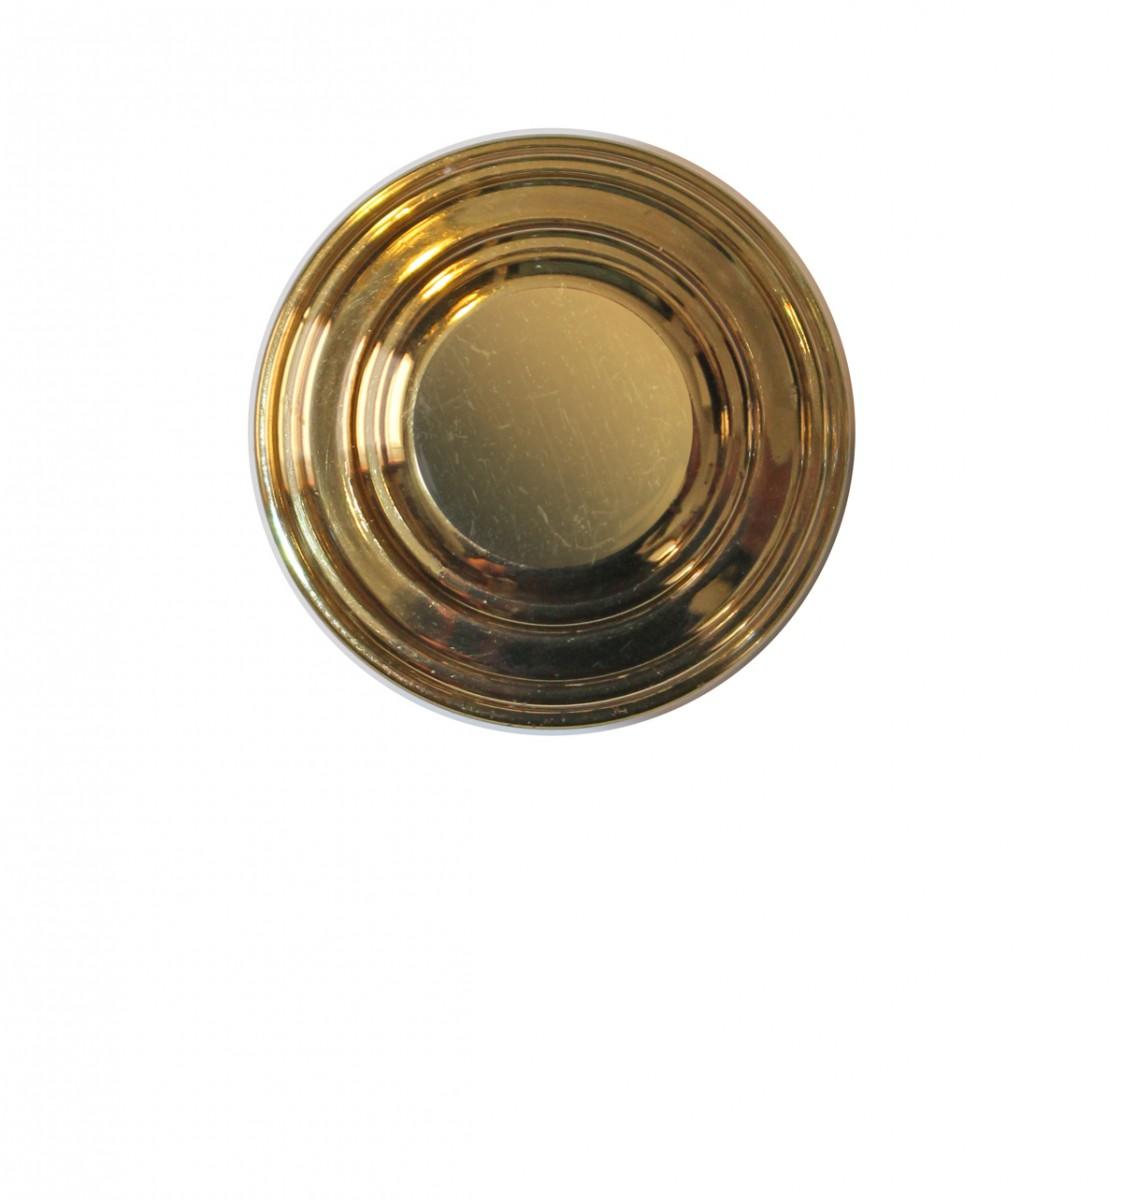 Cabinet Knob Brass Double Flare 1 14 Dia Cabinet Hardware Cabinet Knobs Cabinet Knob